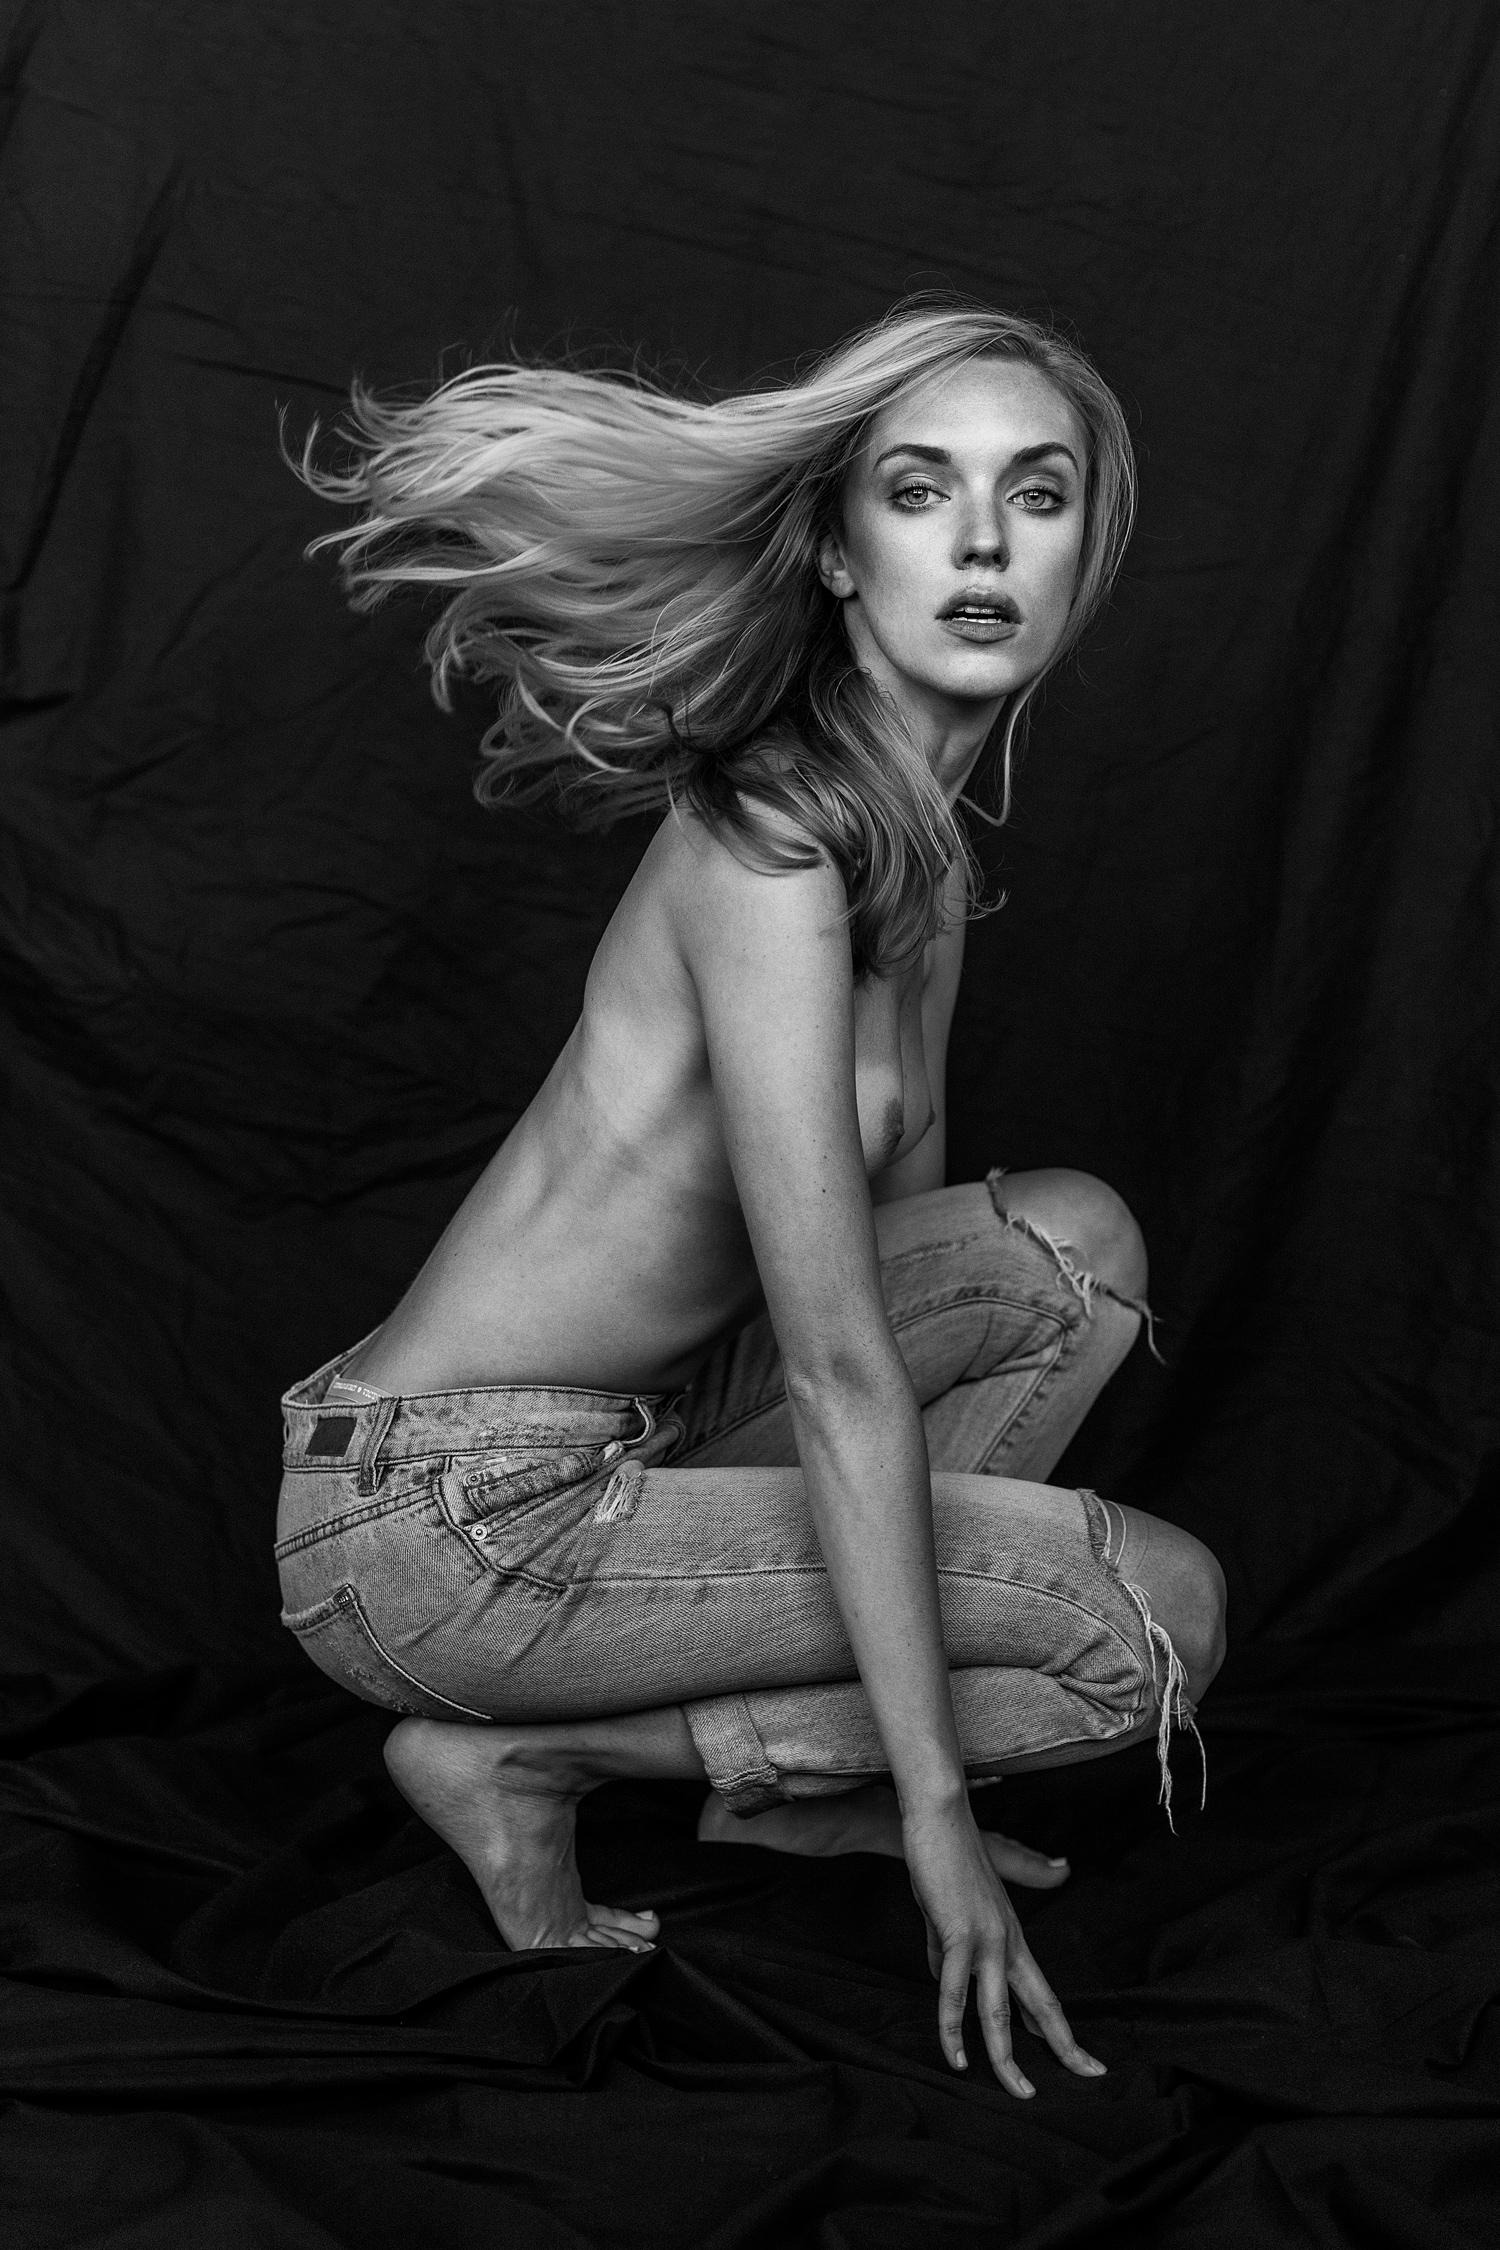 Weronika---Crouch-copy.jpg